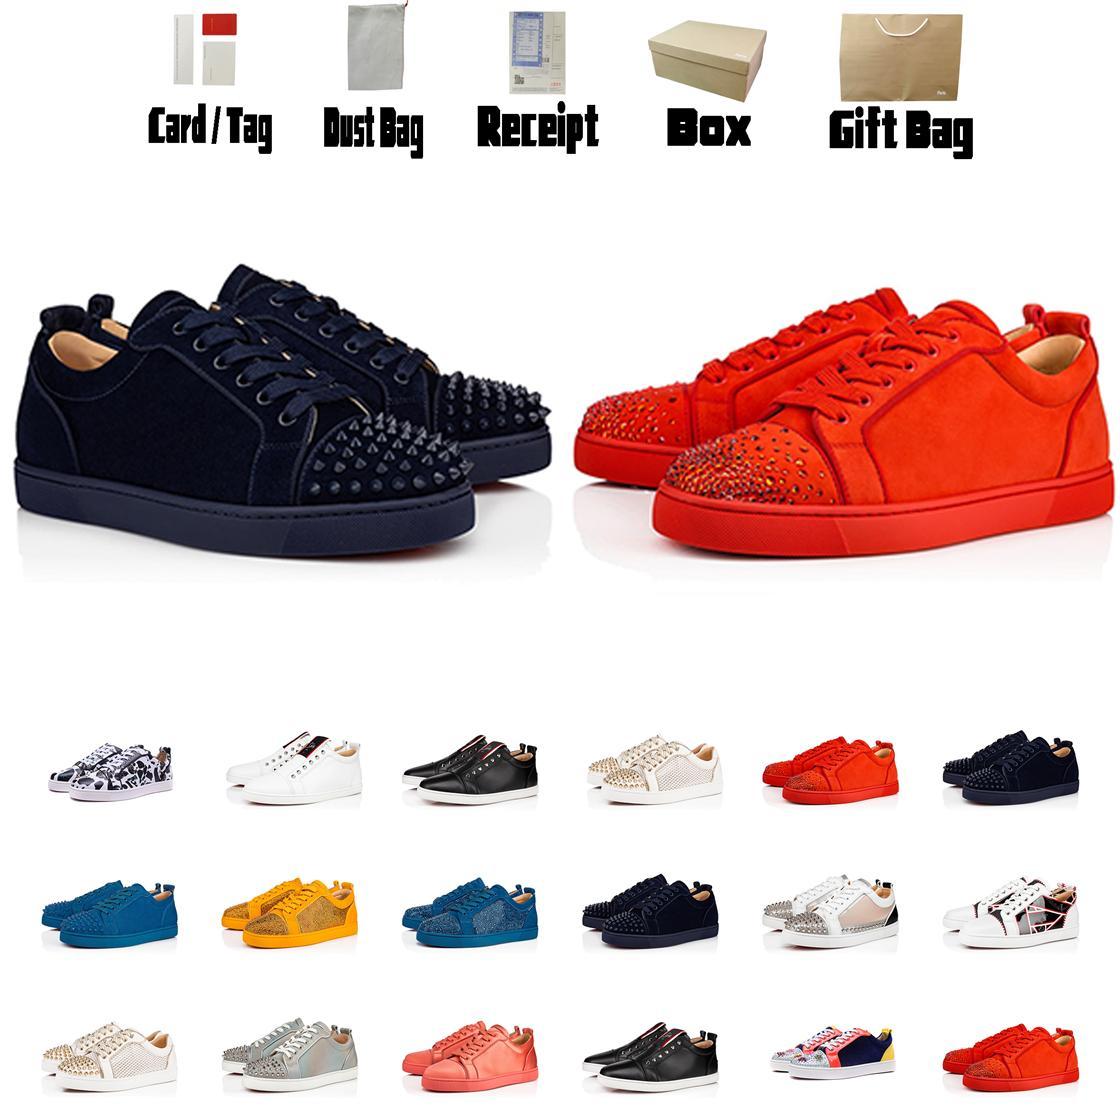 Luxurys Designers Sapatos Vermelho Bottom Men Sneakers Botas Botas Top Top Top Treinadores Botas Planas Tamanho US5-US13